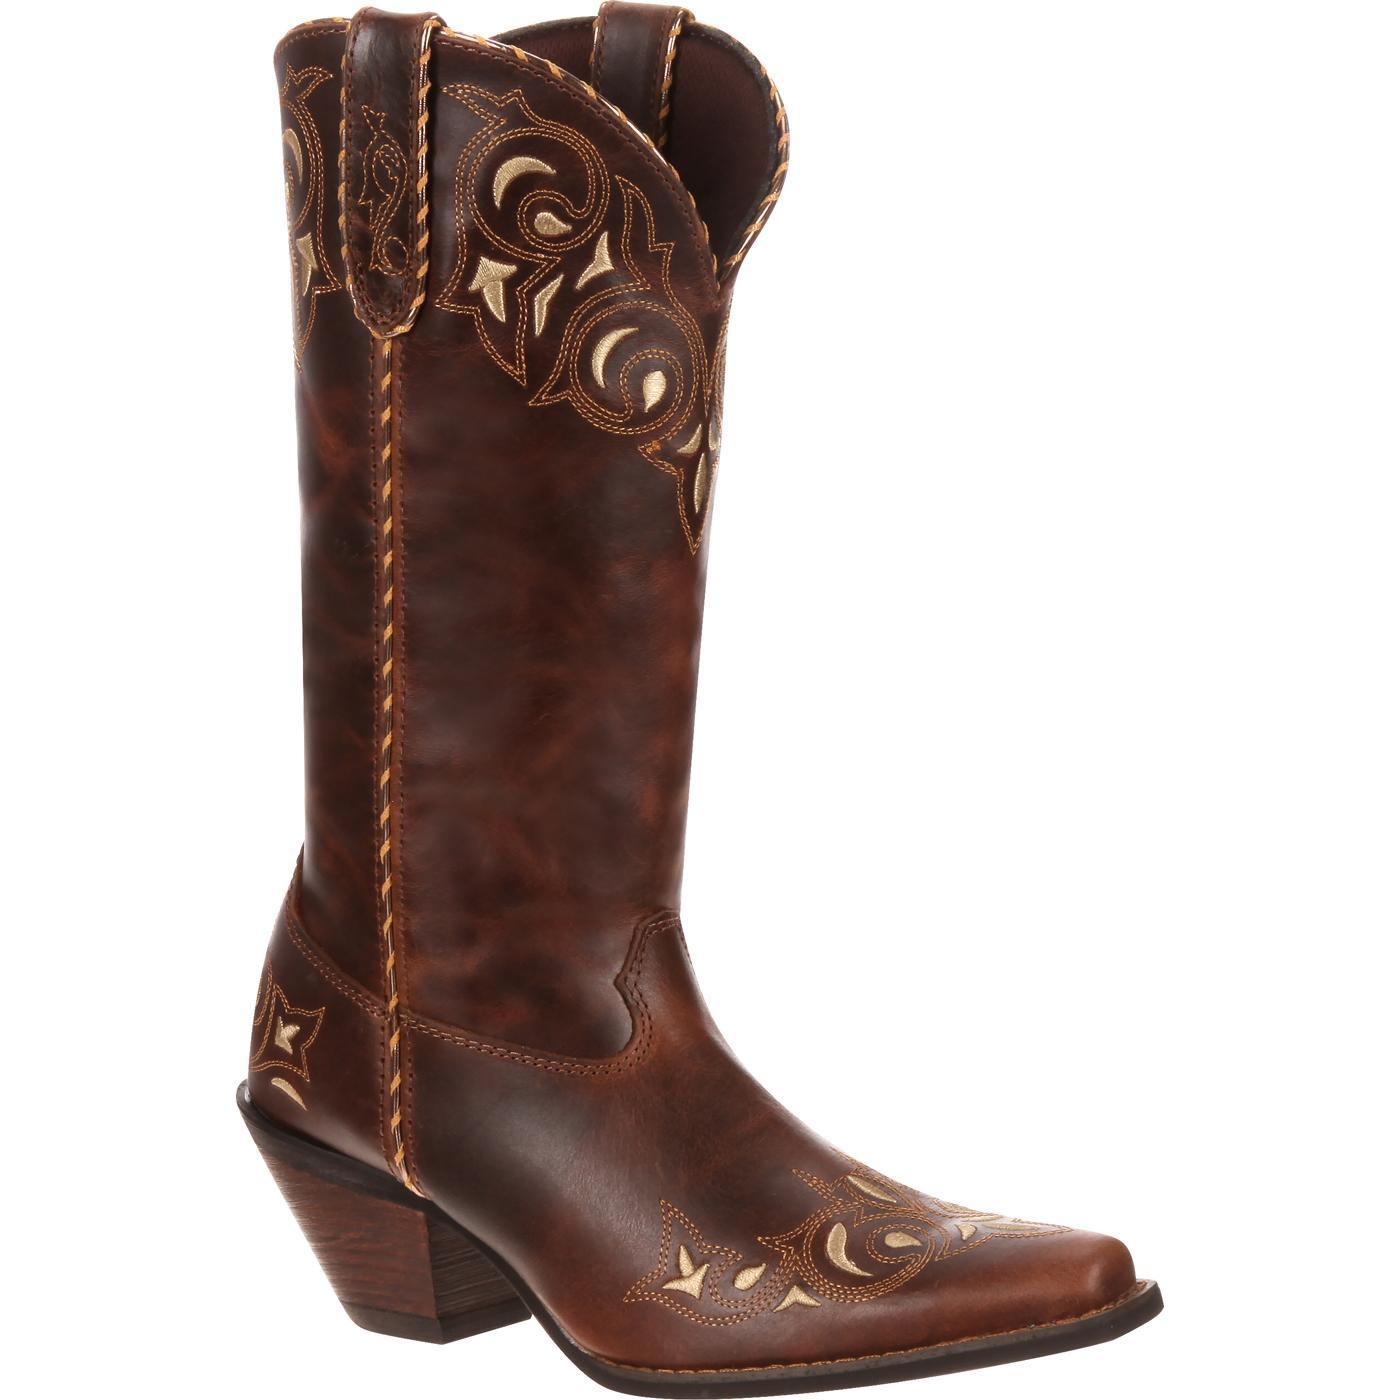 Discount Sale Women Durango Boot RD5414 12 Sandy Brown